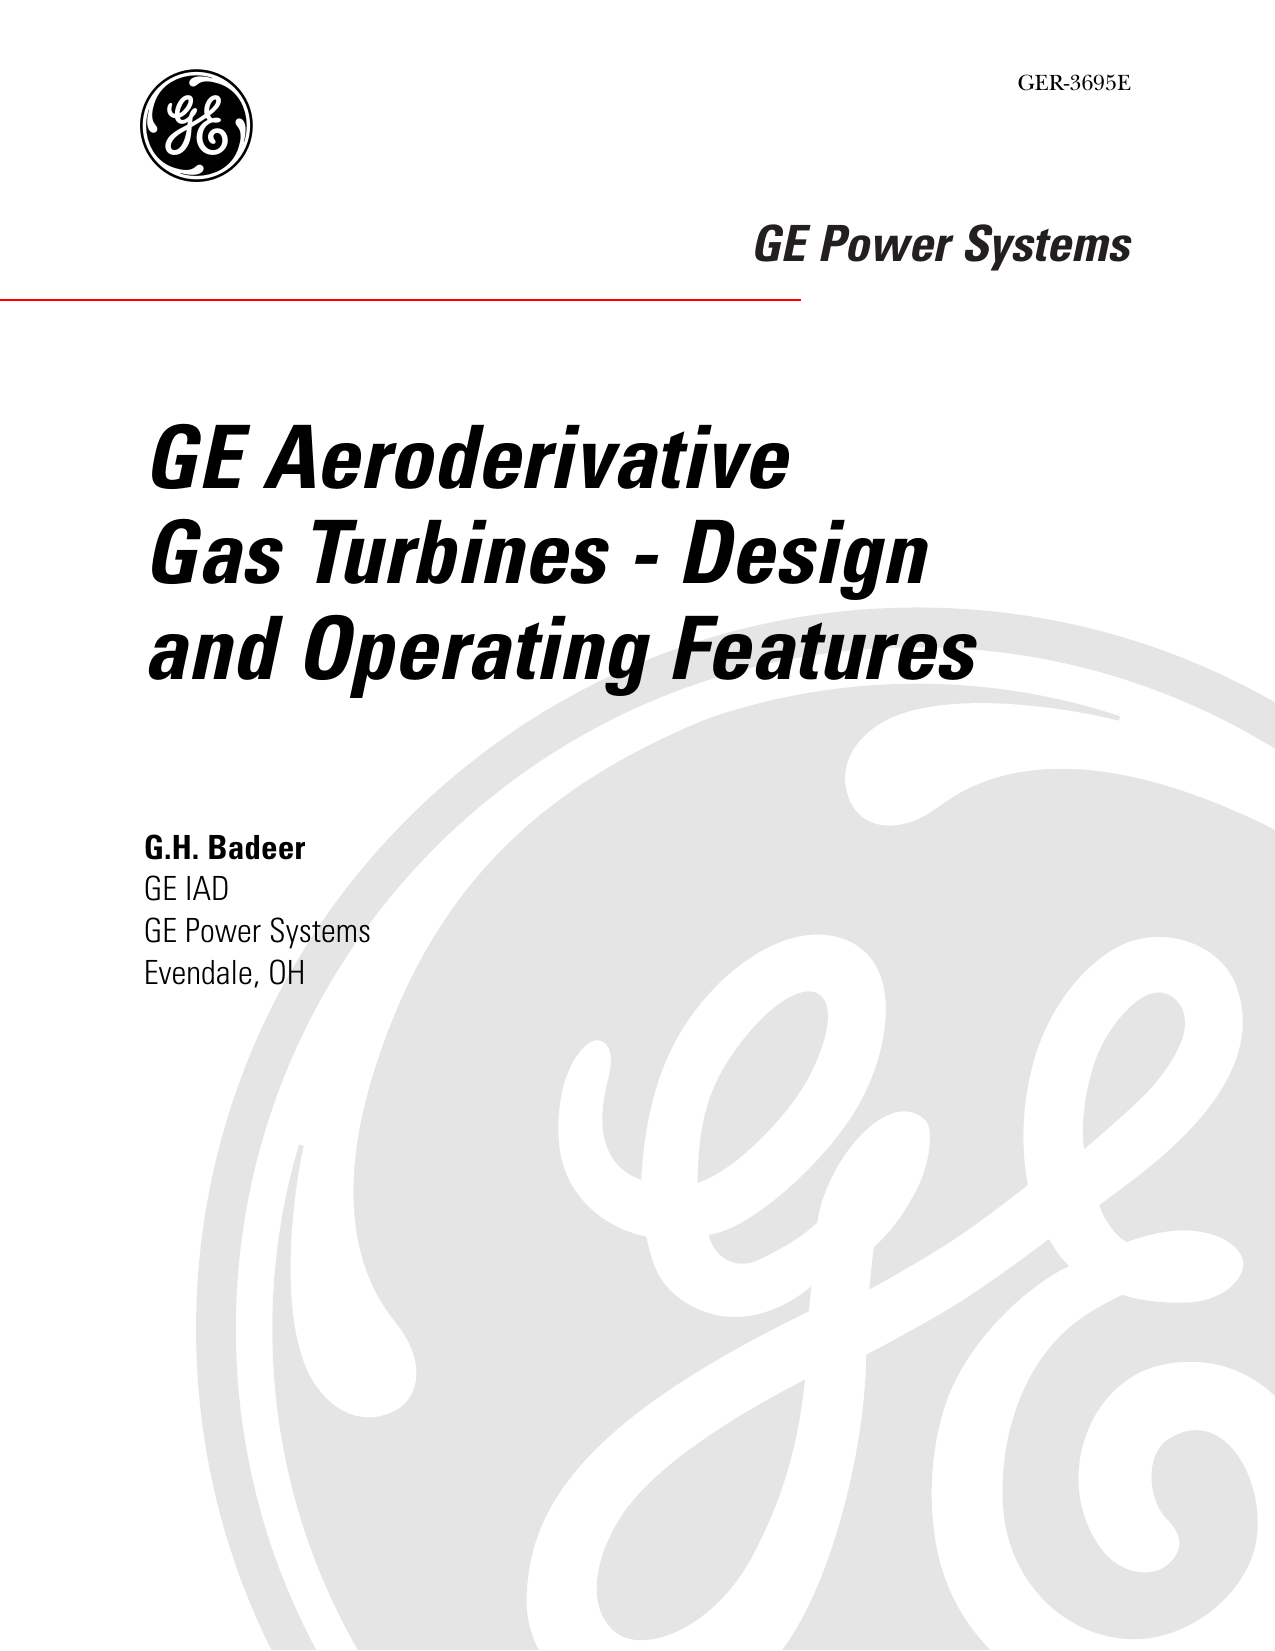 GER-3695E - GE Aeroderivative Gas Turbines: Design